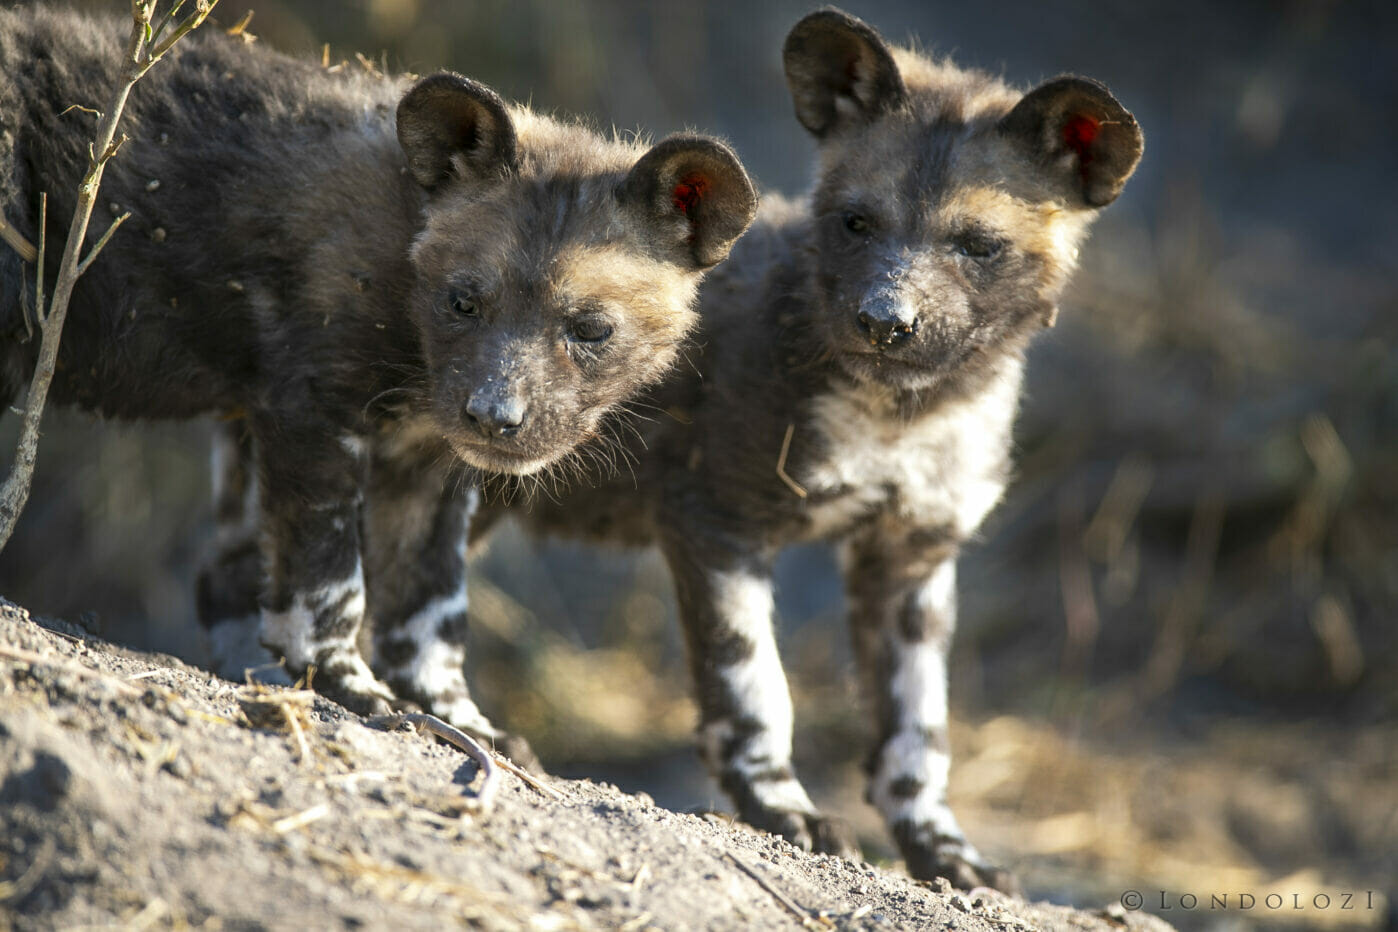 Sdz wild dog pups at entrance to den